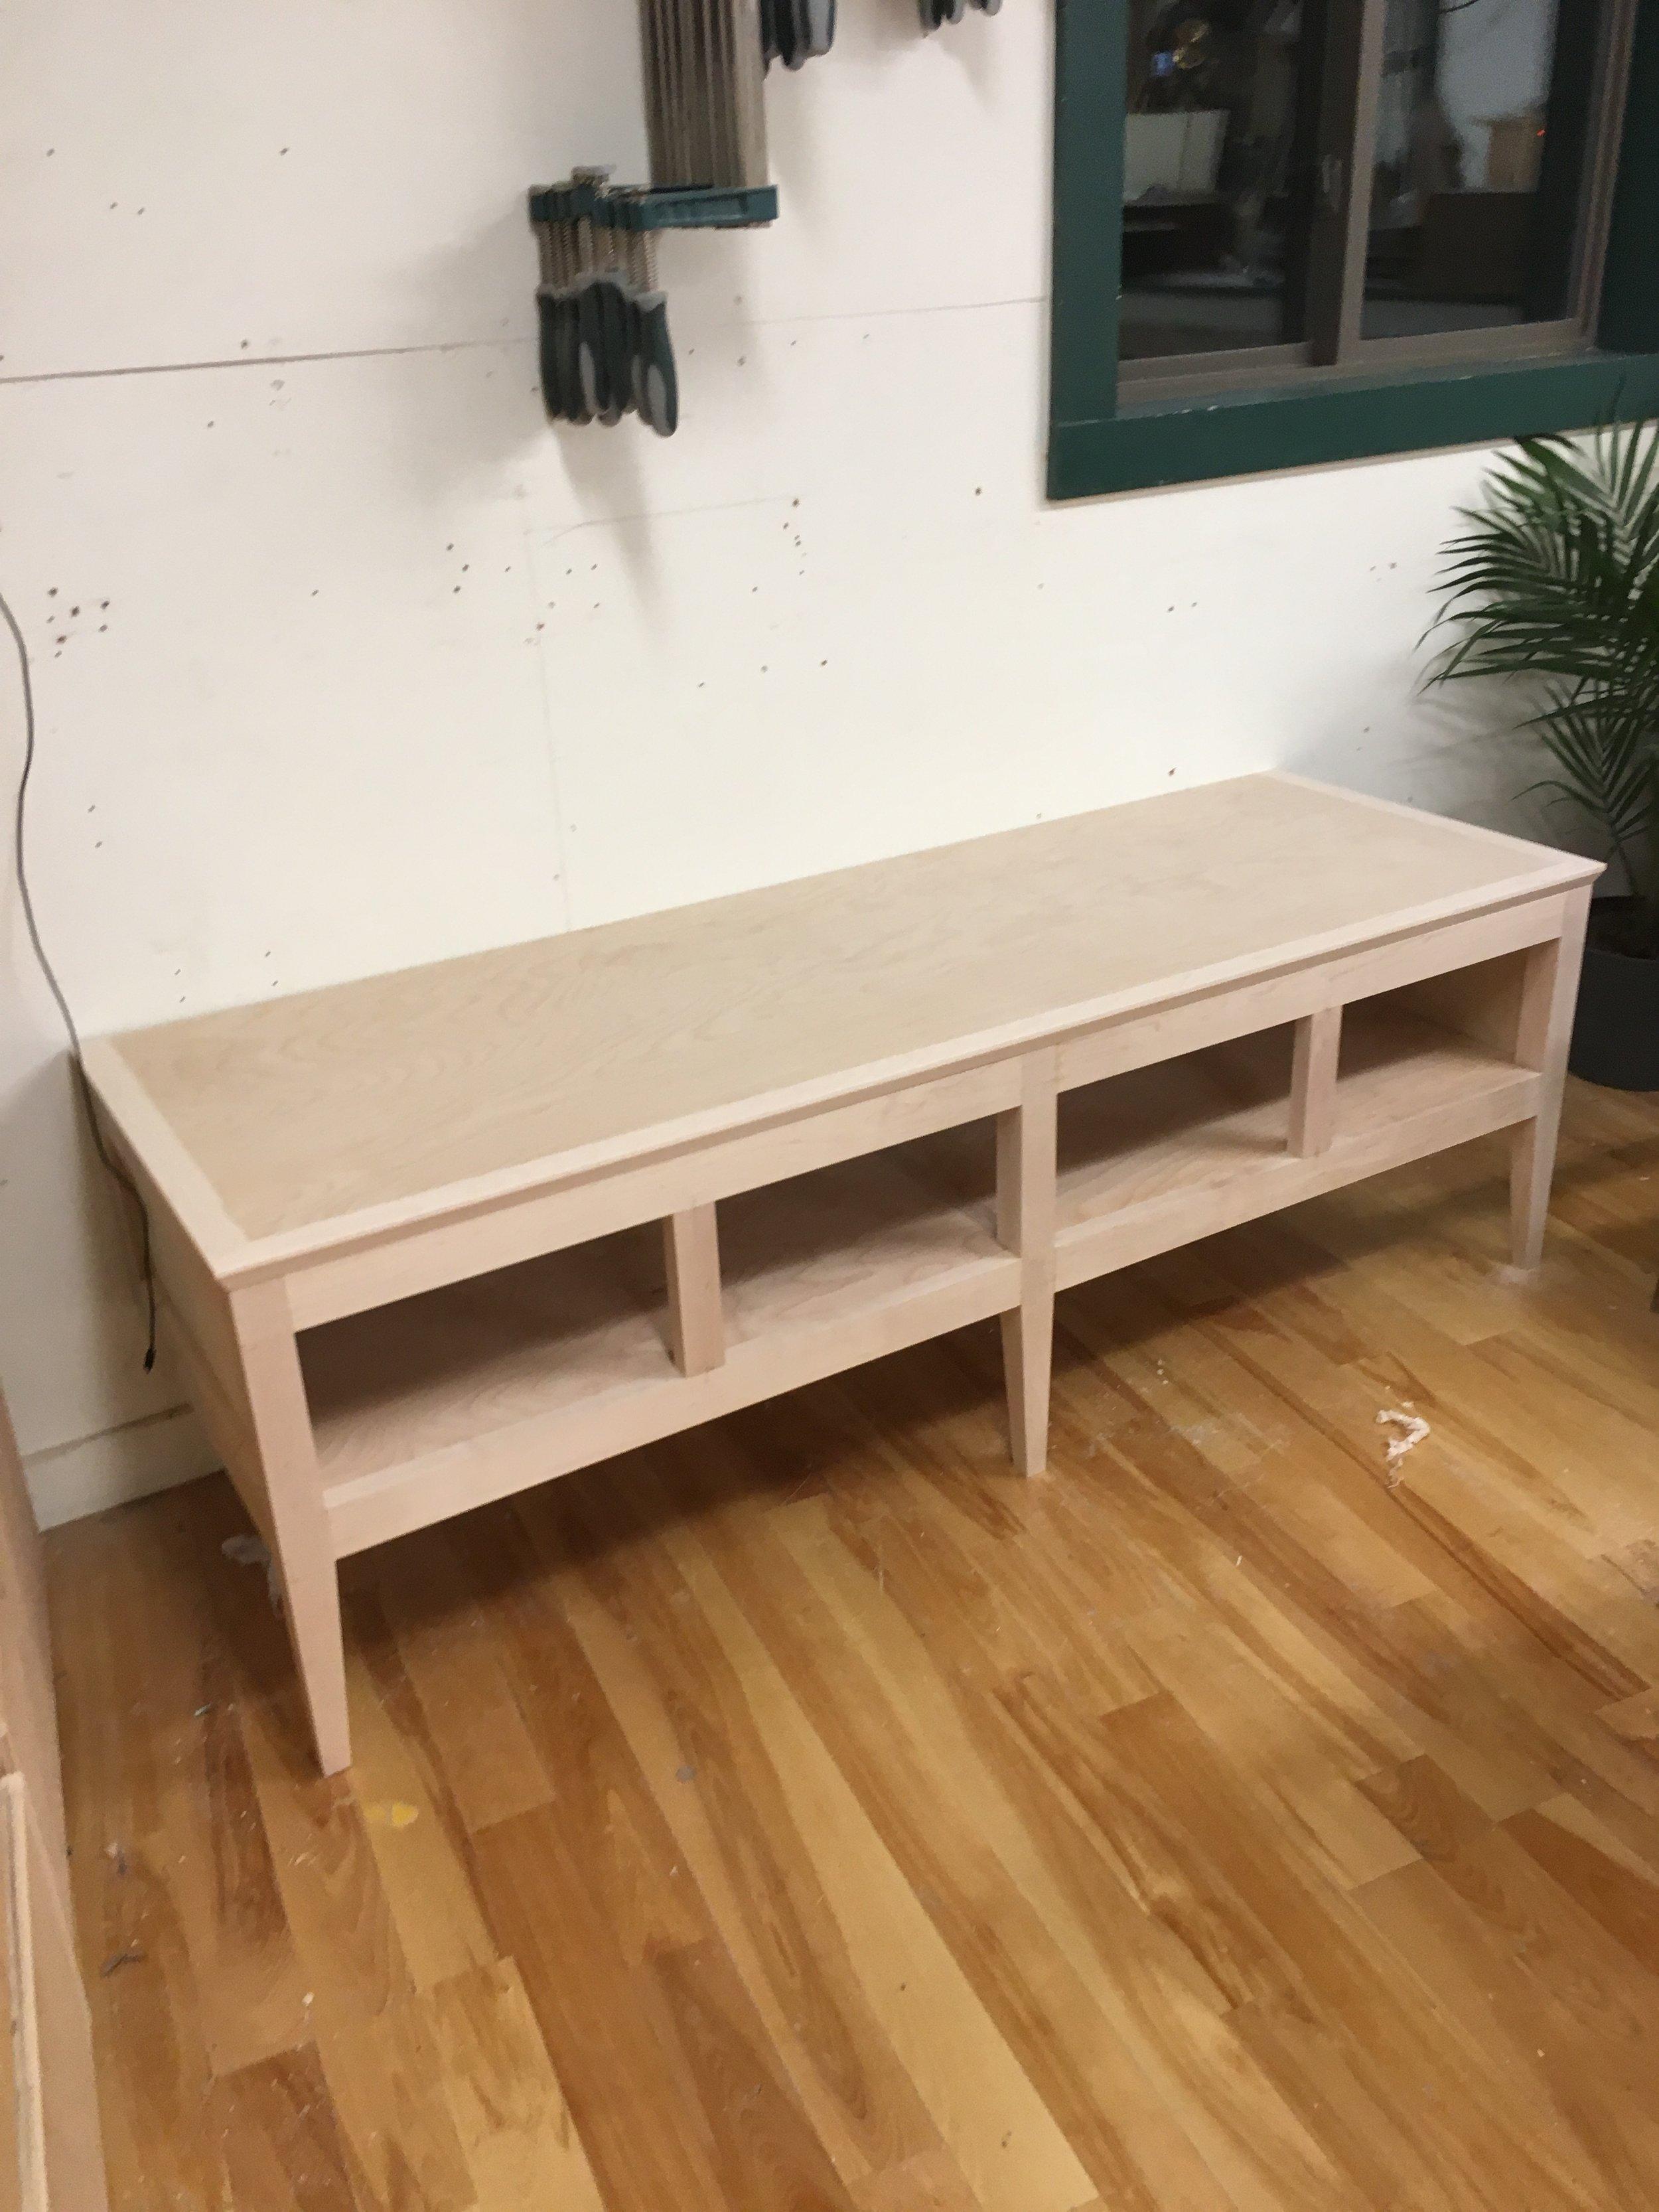 Hone Design Co._Dorchester Bench 5